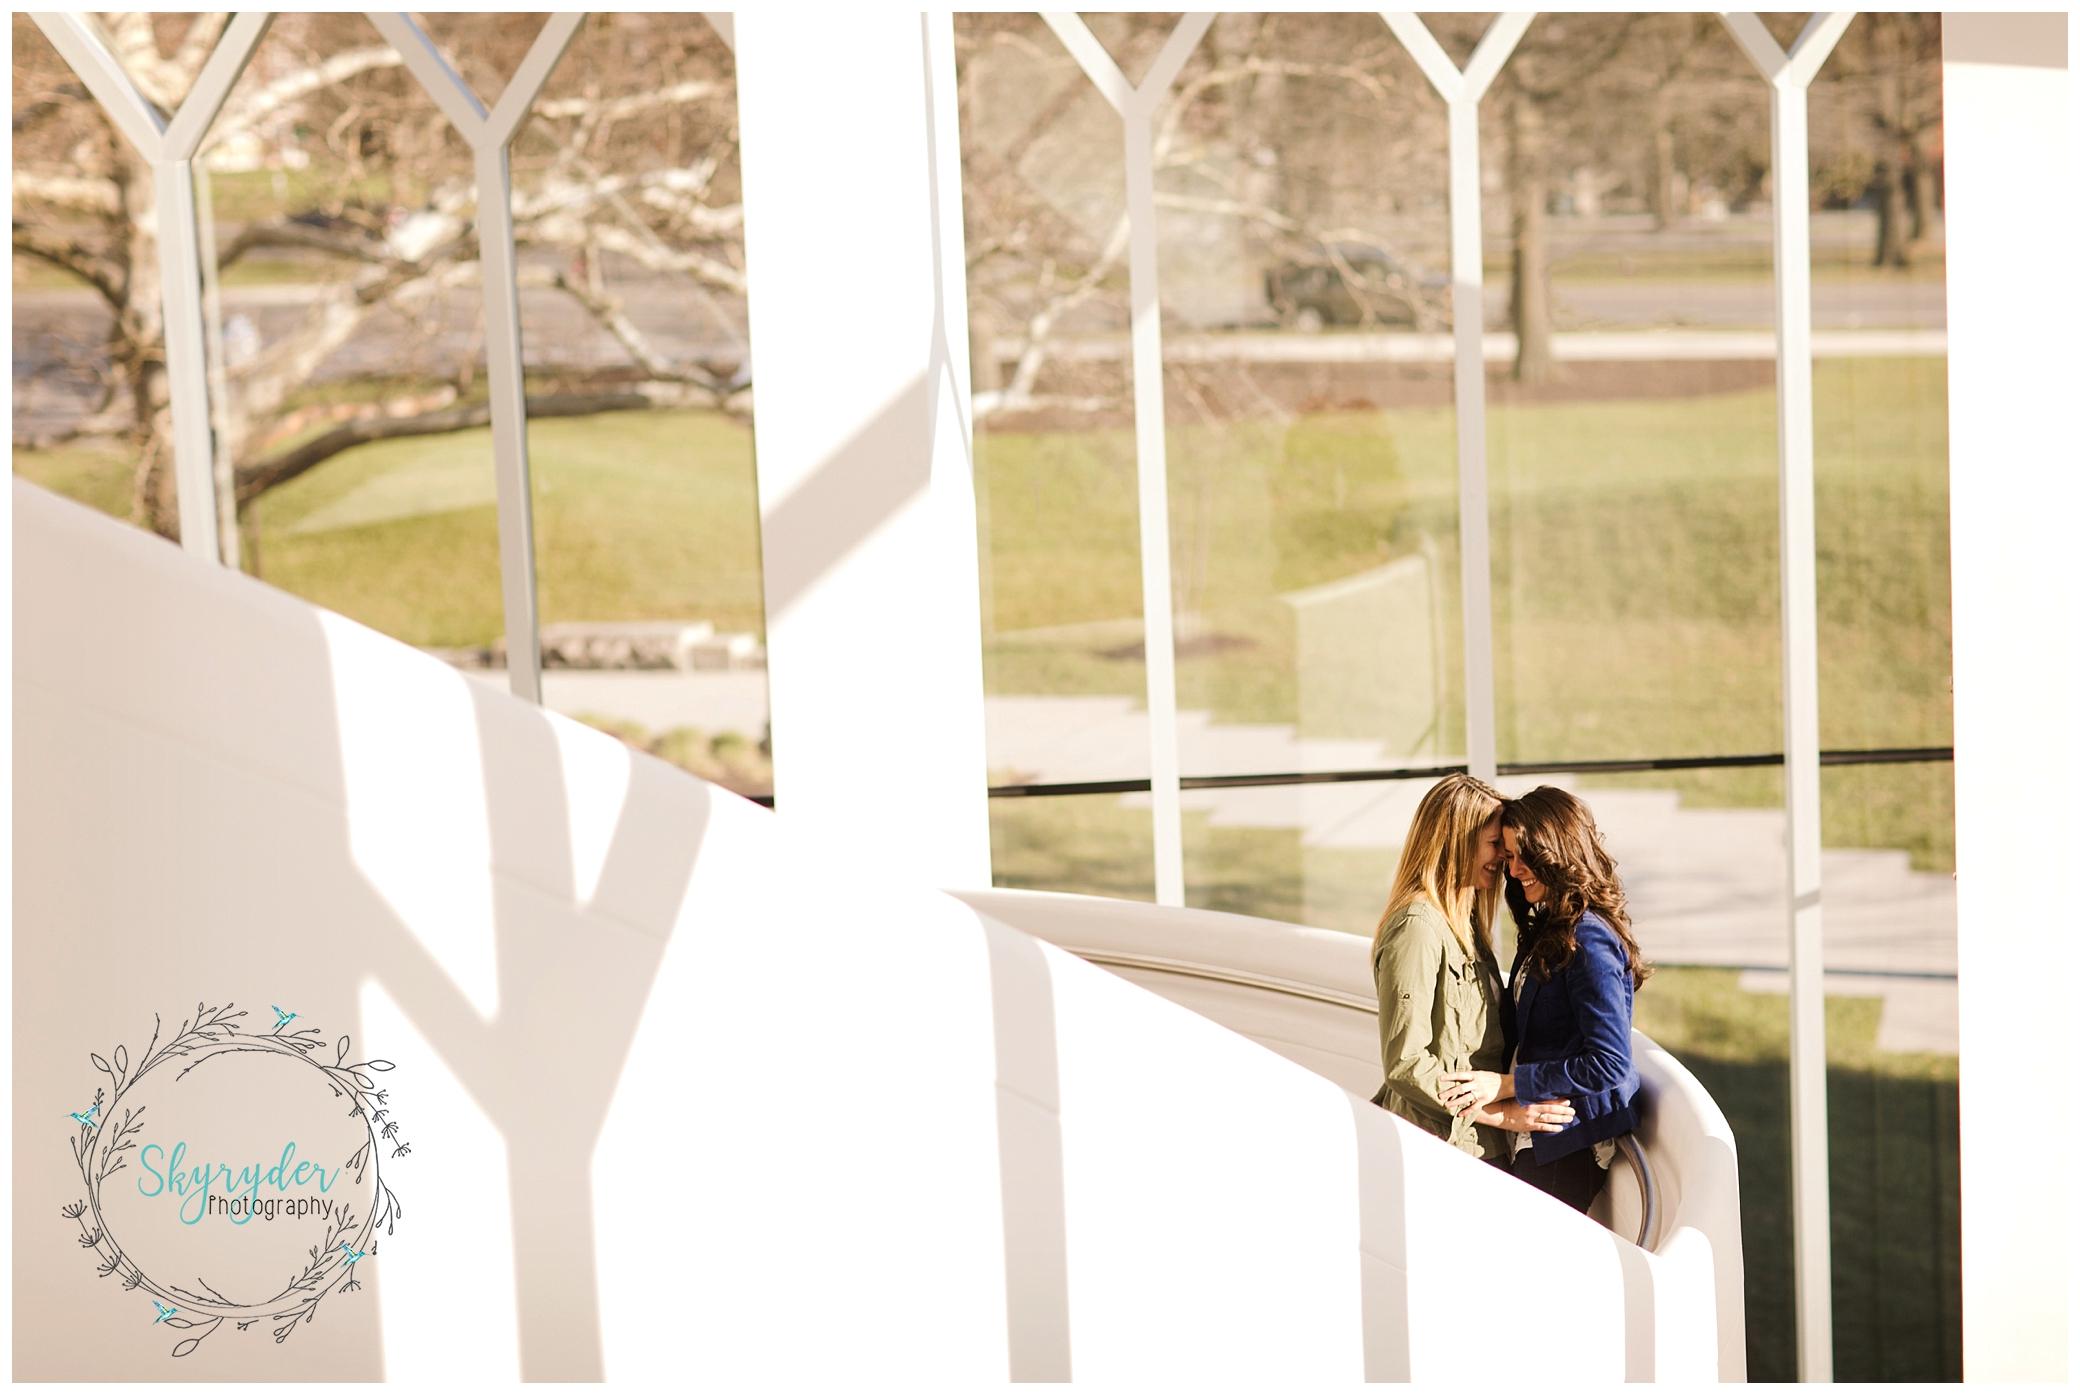 engagement wedding photographer photography blacksburg roanoke skyryder san francisco california virginia